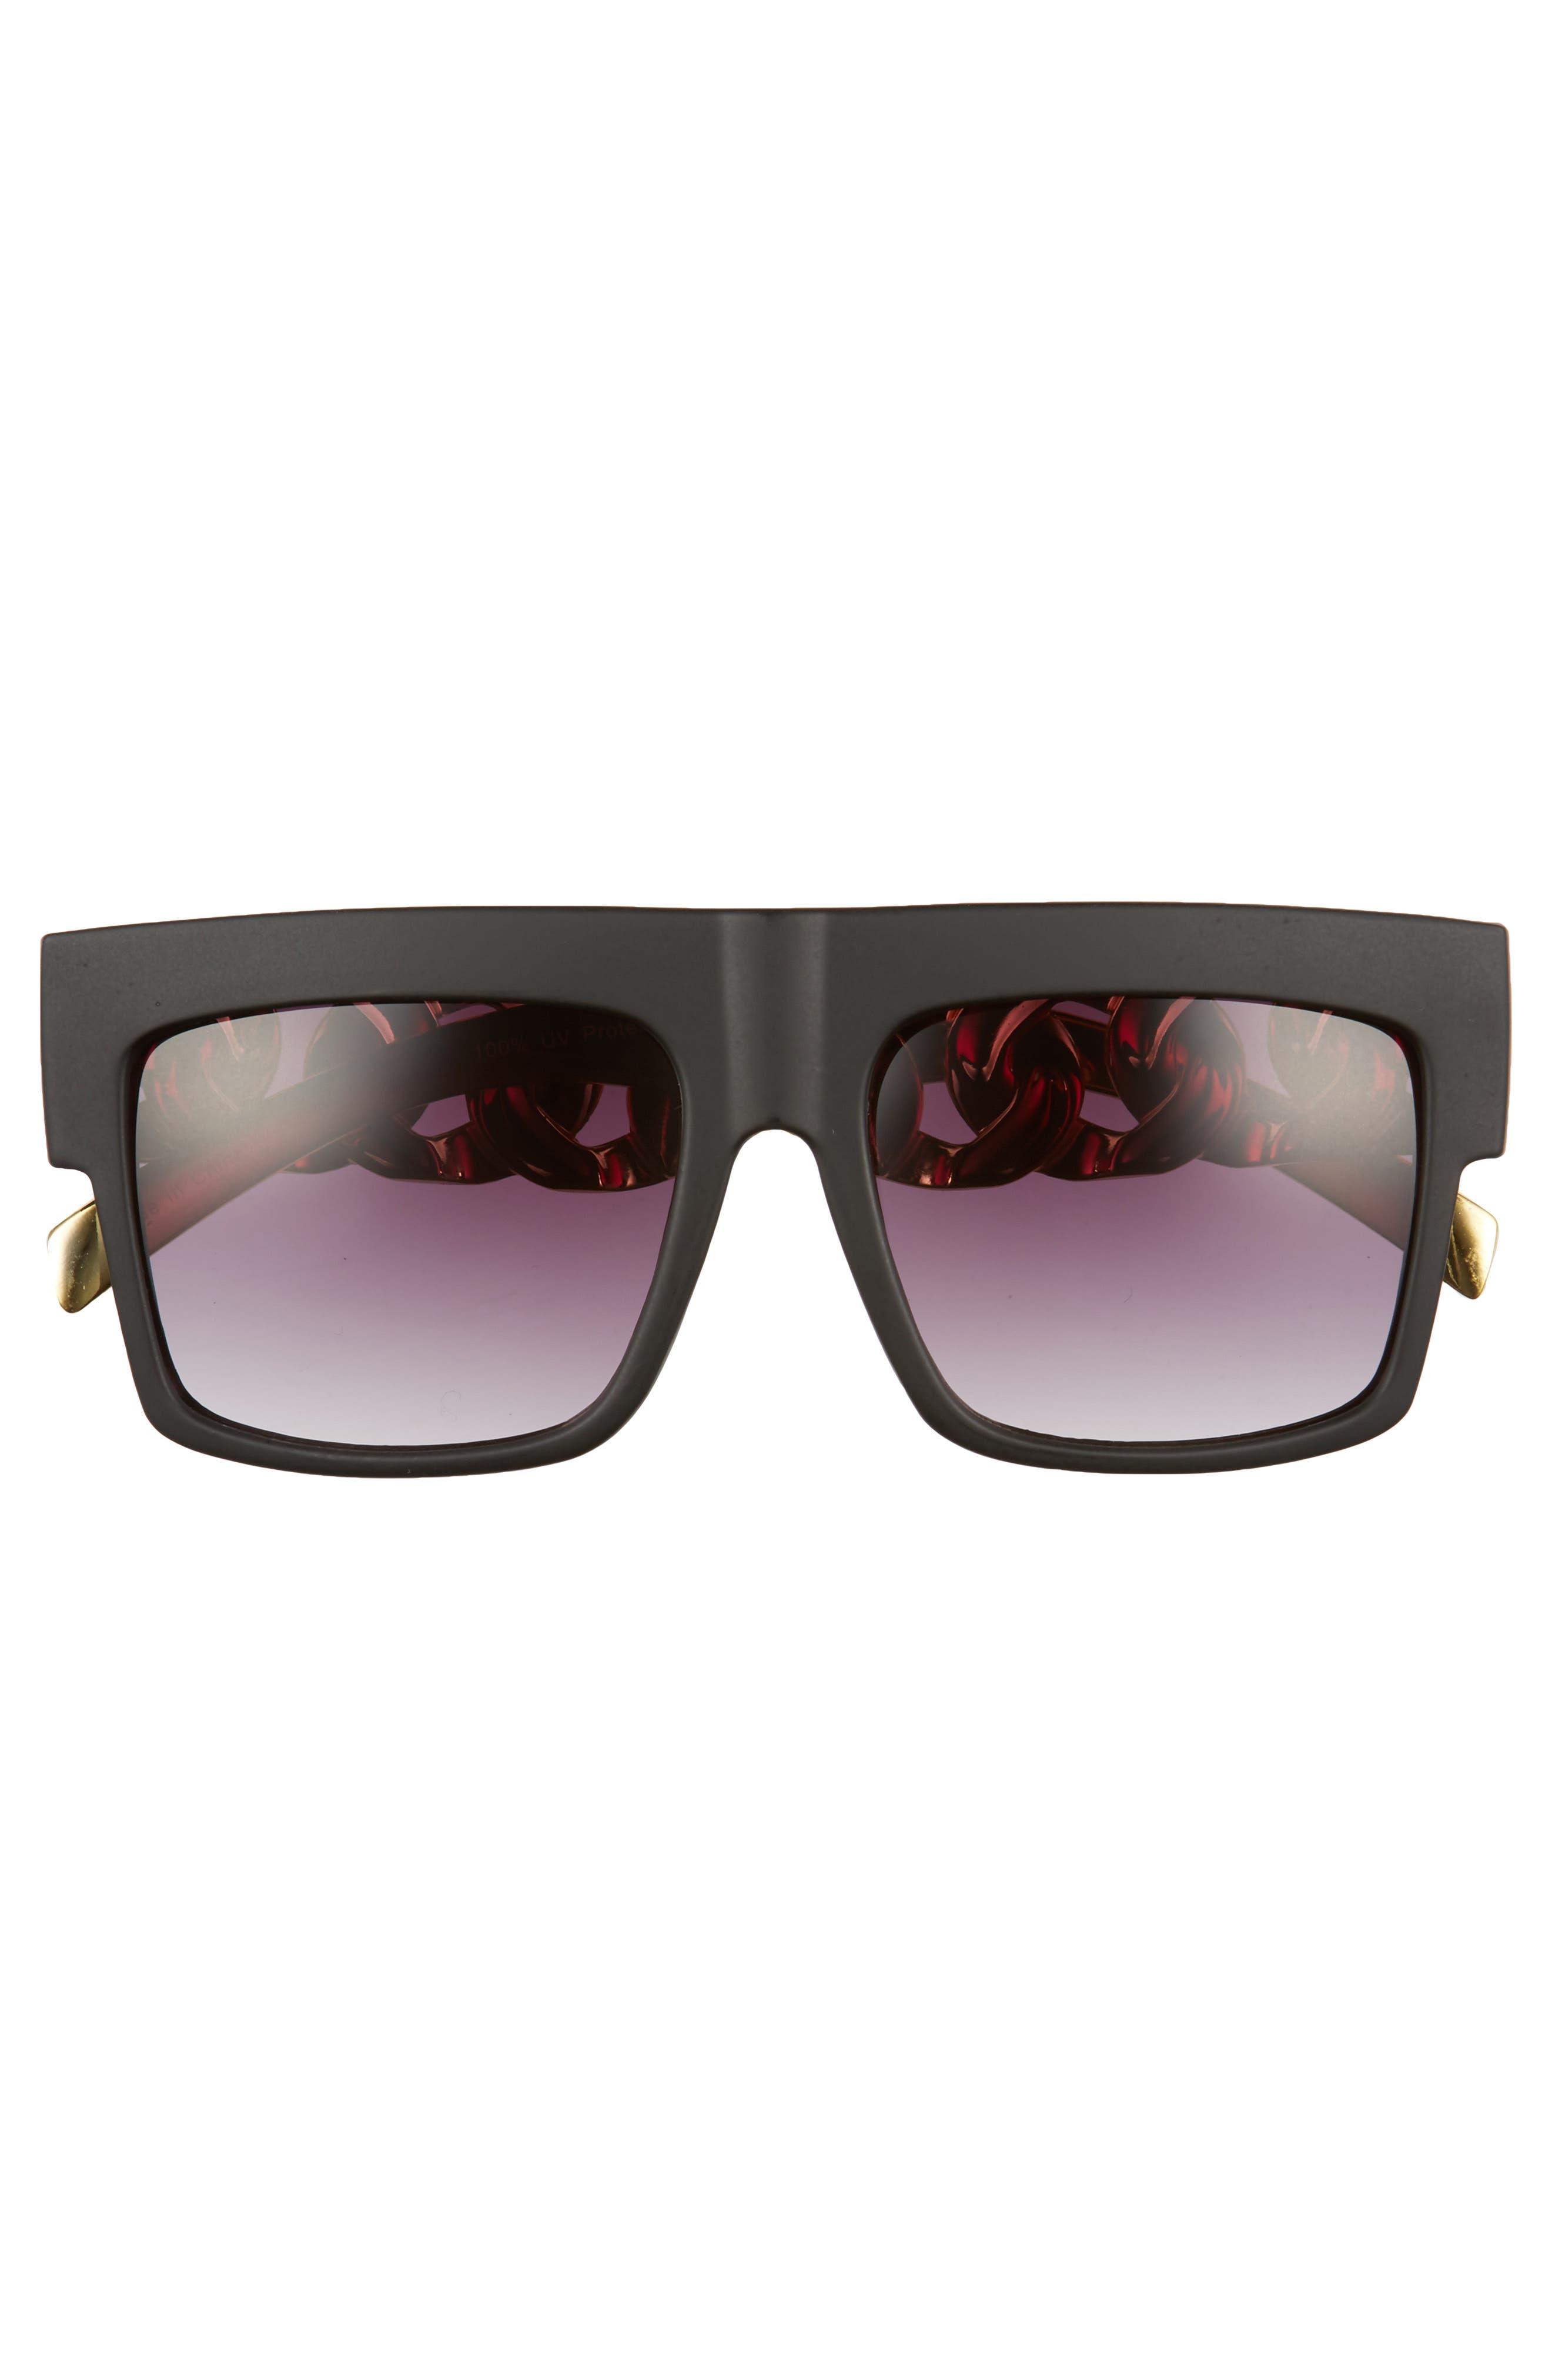 52mm Chain Detail Shield Sunglasses,                             Alternate thumbnail 3, color,                             Black/ Gold